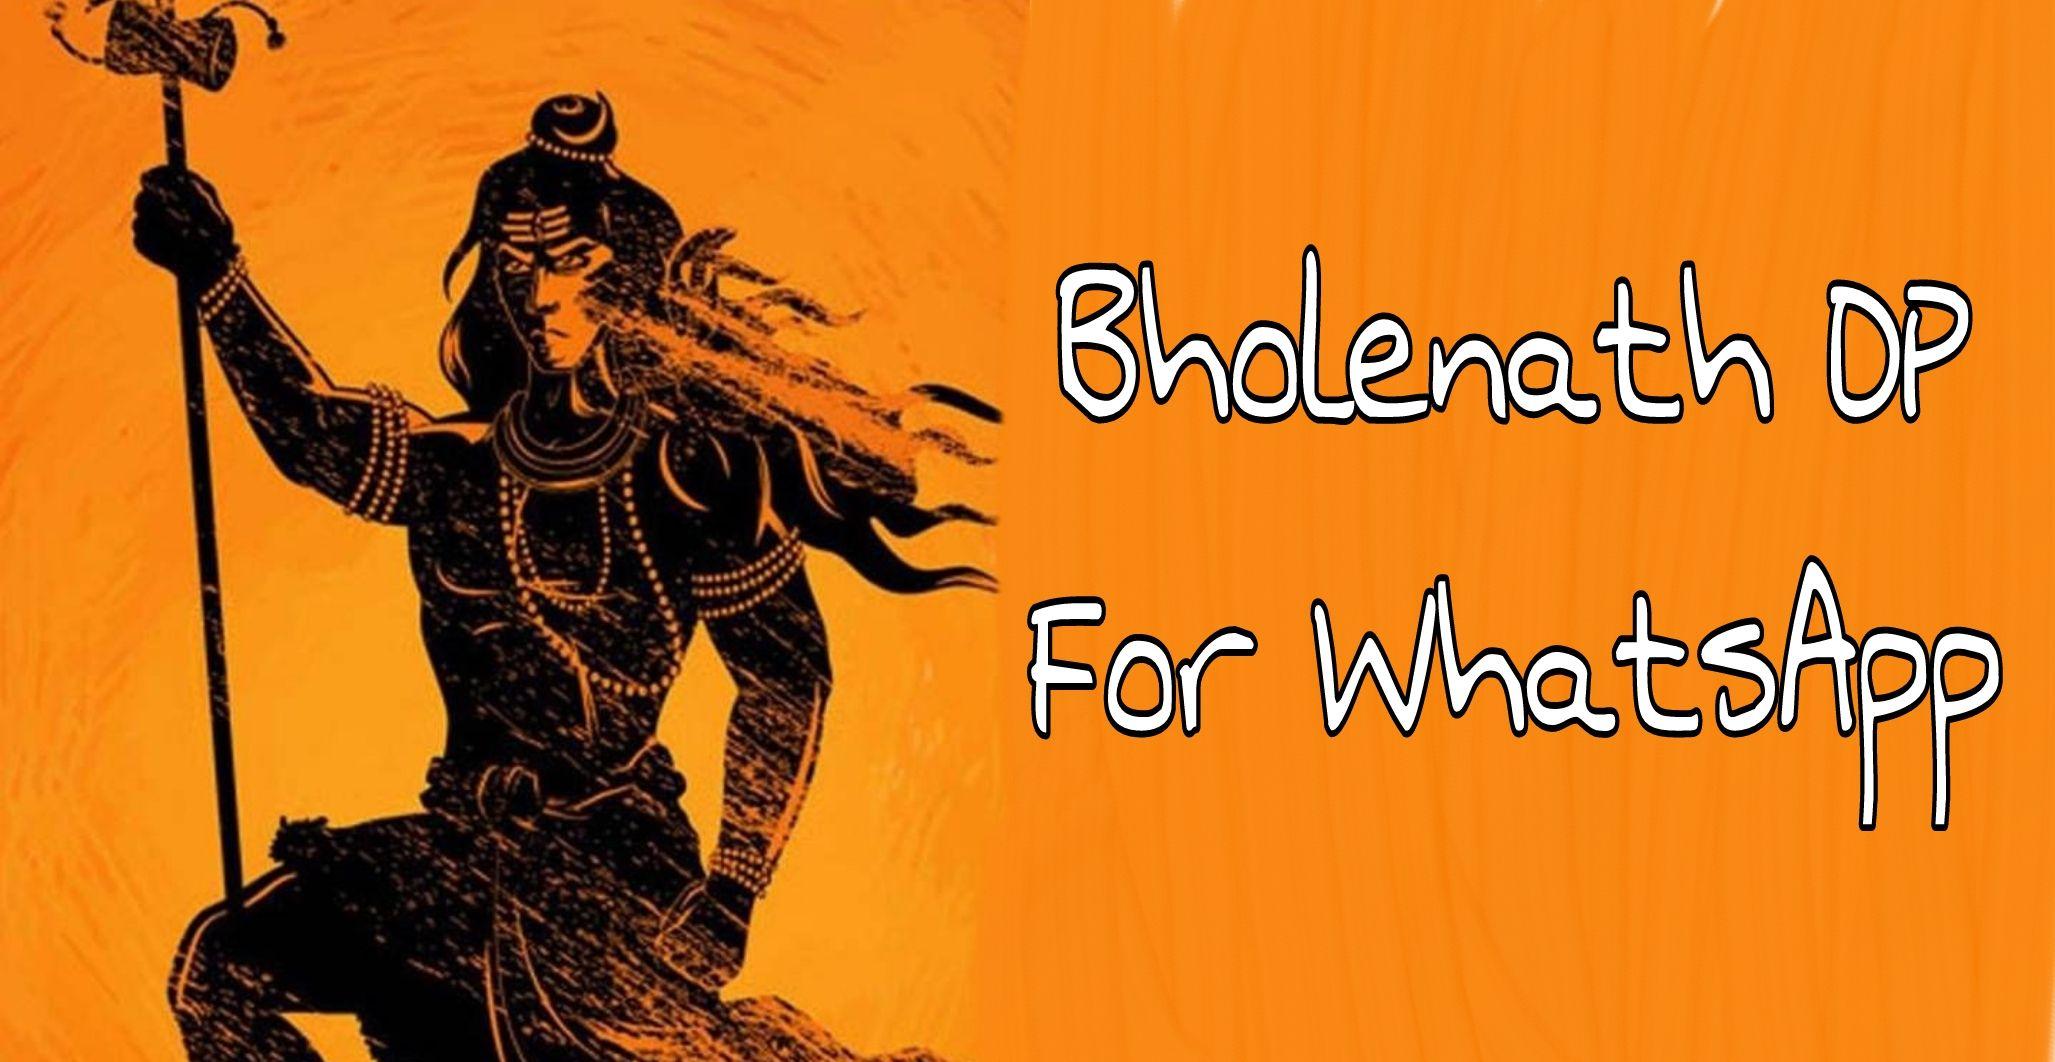 Bholenath dp